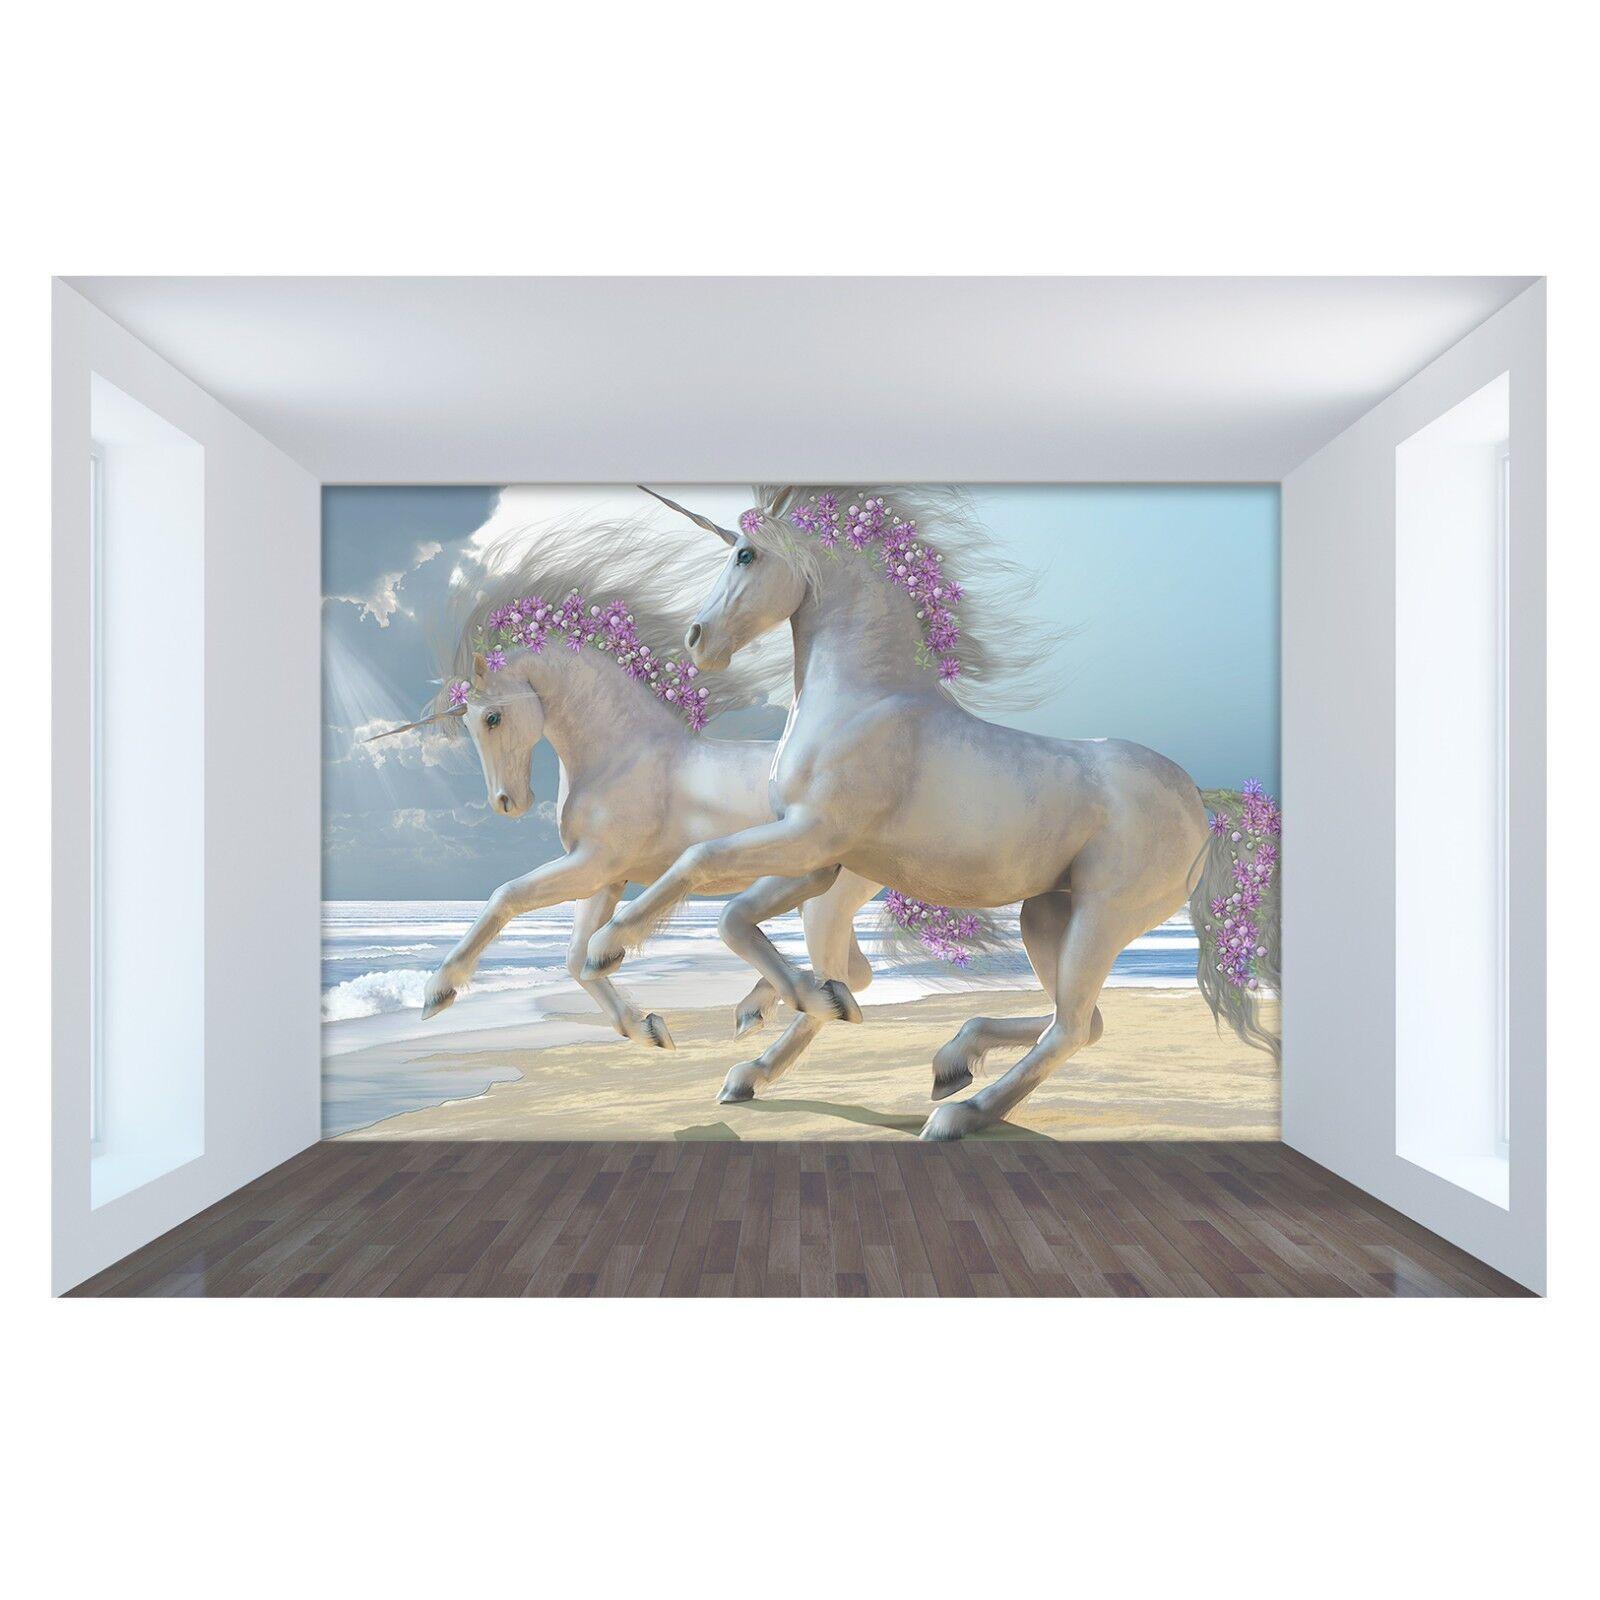 3D 3D 3D Beautiful Unicorn Sea 8 Wallpaper Mural Print Wall Indoor Wallpaper Murals UK 906342